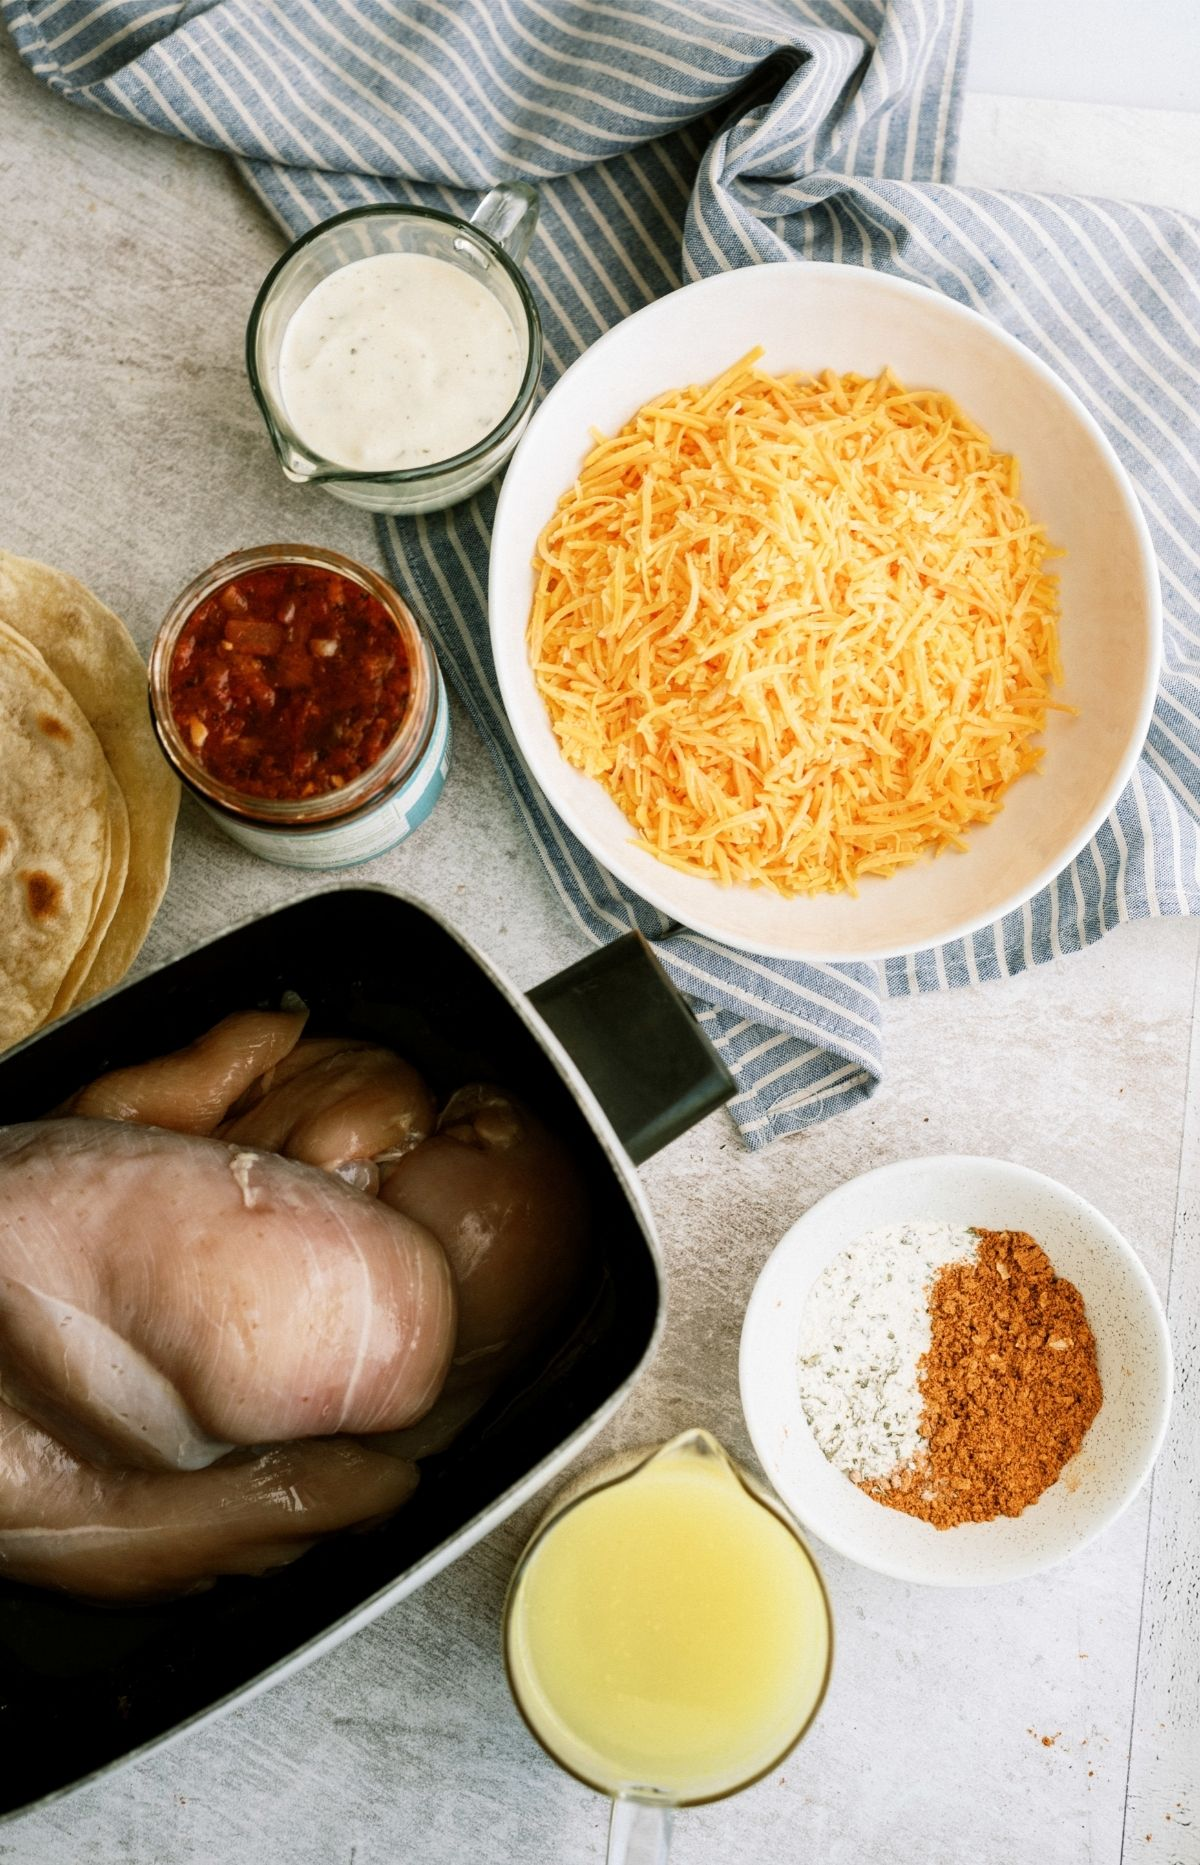 Ingredients for Slow Cooker Ranch Chicken Enchiladas Recipe